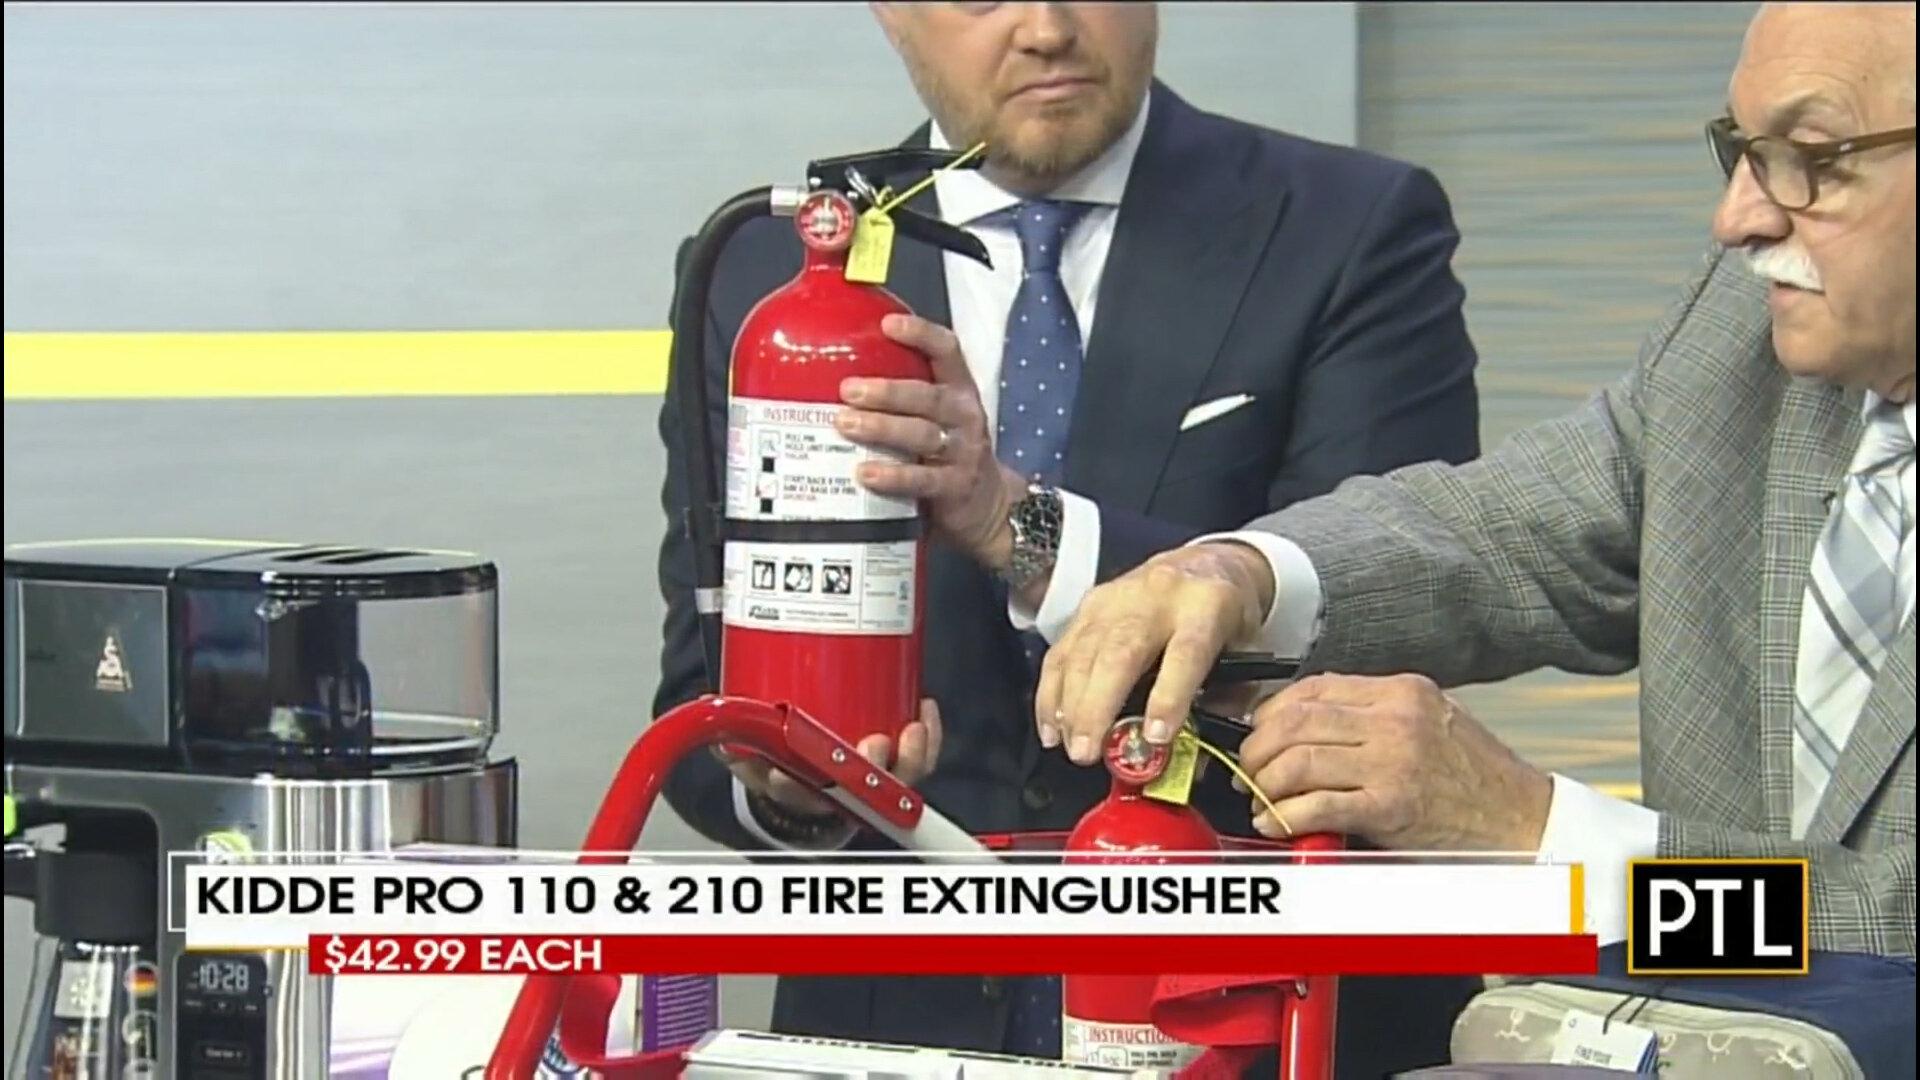 KIDDE PRO 110 & 210 FIRE EXTINGUISHER - $49.99Shop Now